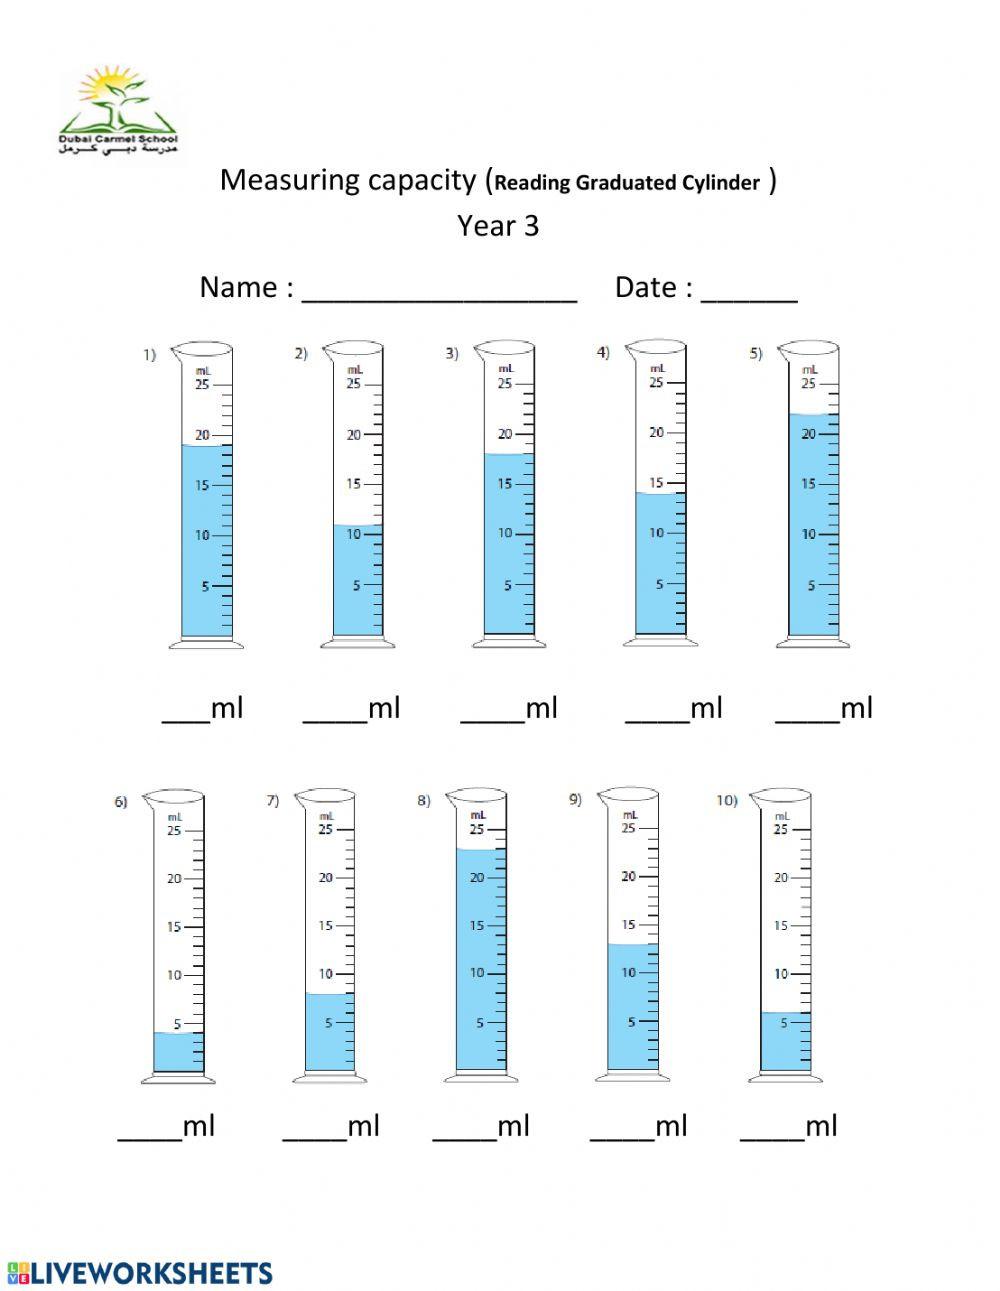 Reading A Graduated Cylinder Worksheet Measuring Capacity Ml Interactive Worksheet